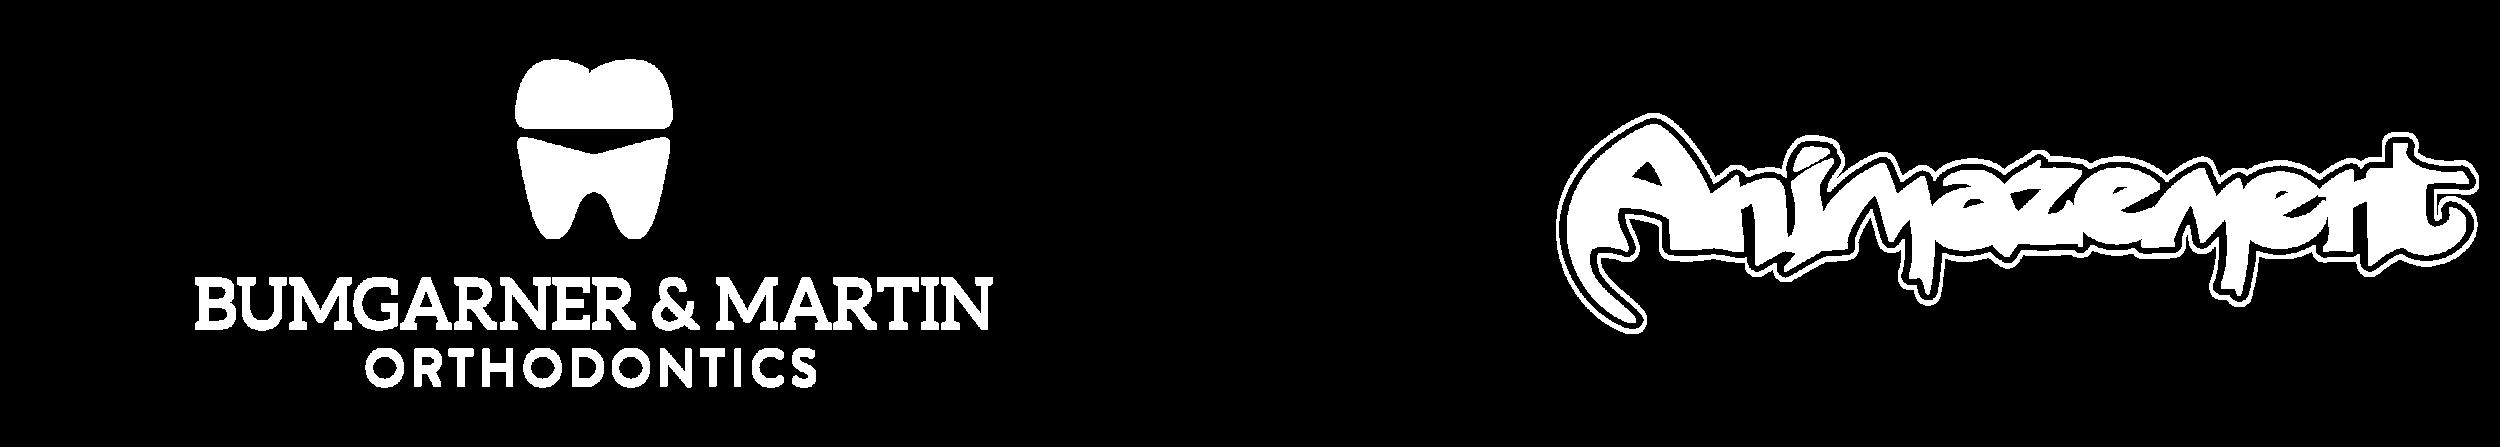 Client logos3-02.png